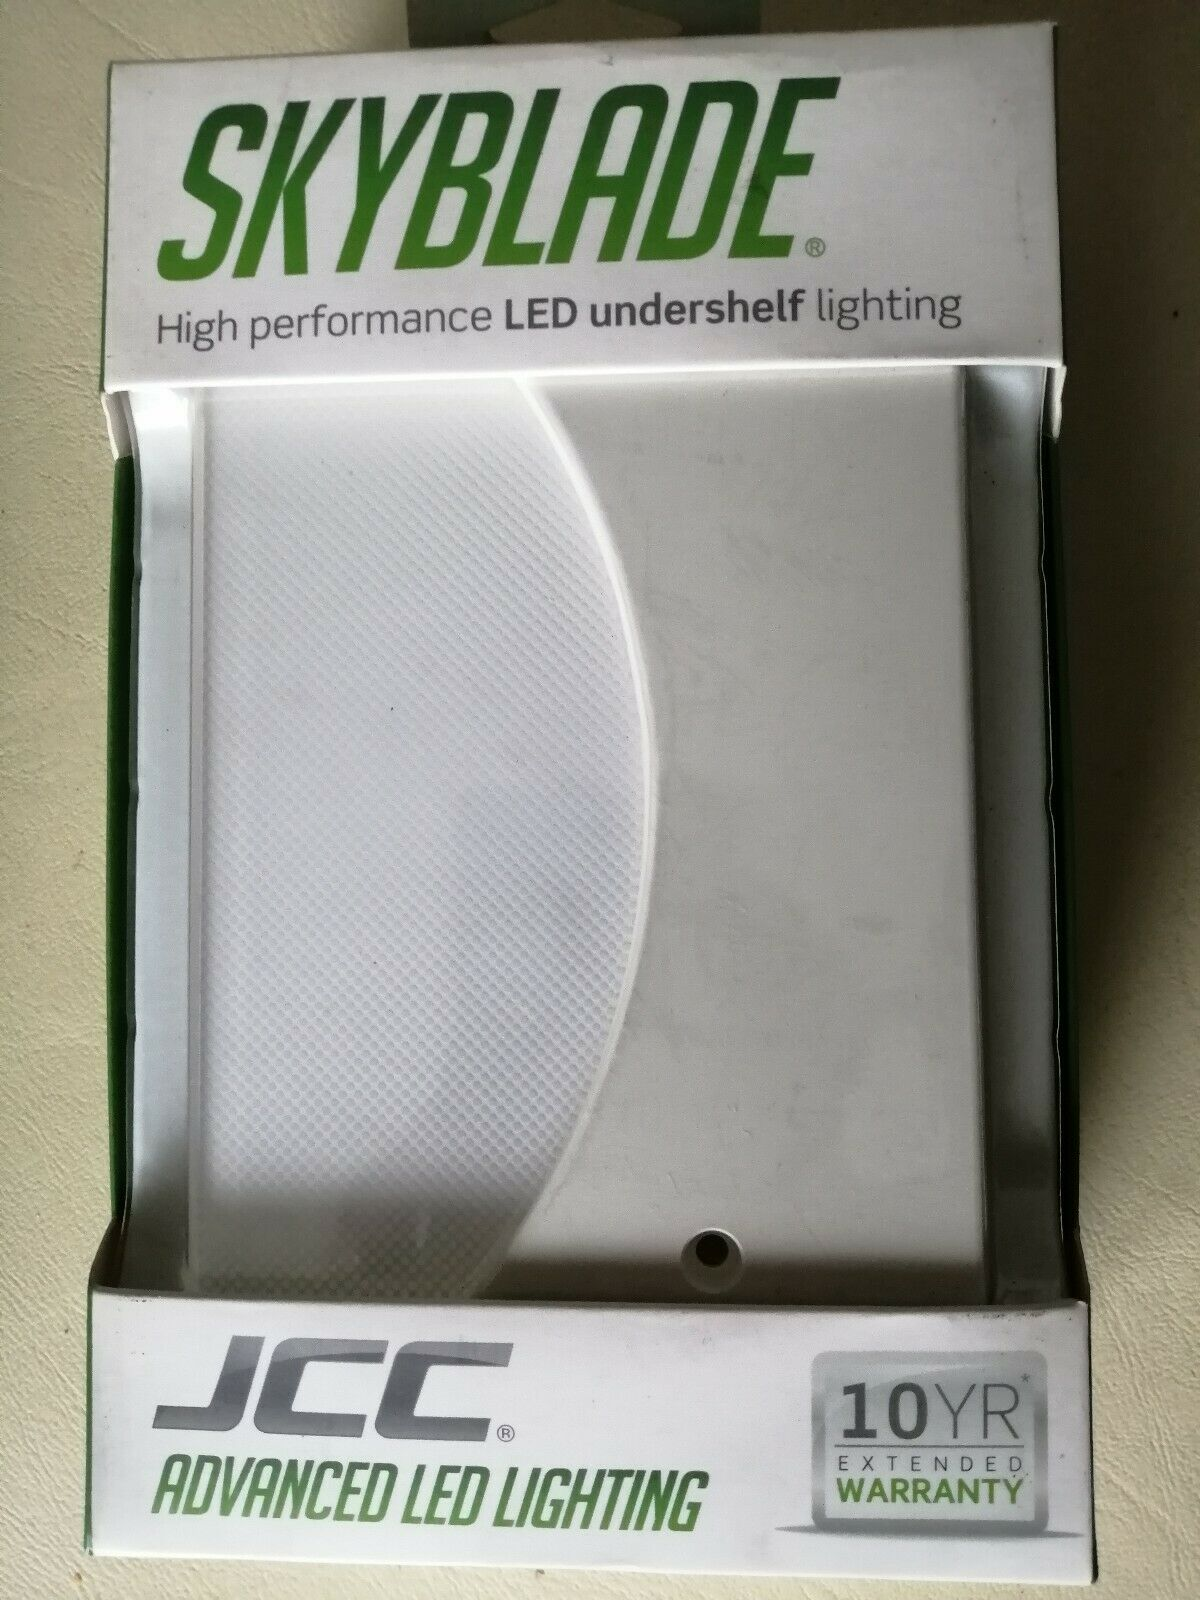 JCC JC83106 Skyblade Starter Kit 4w 150mm LED 3k Cable /& Driver Warm White